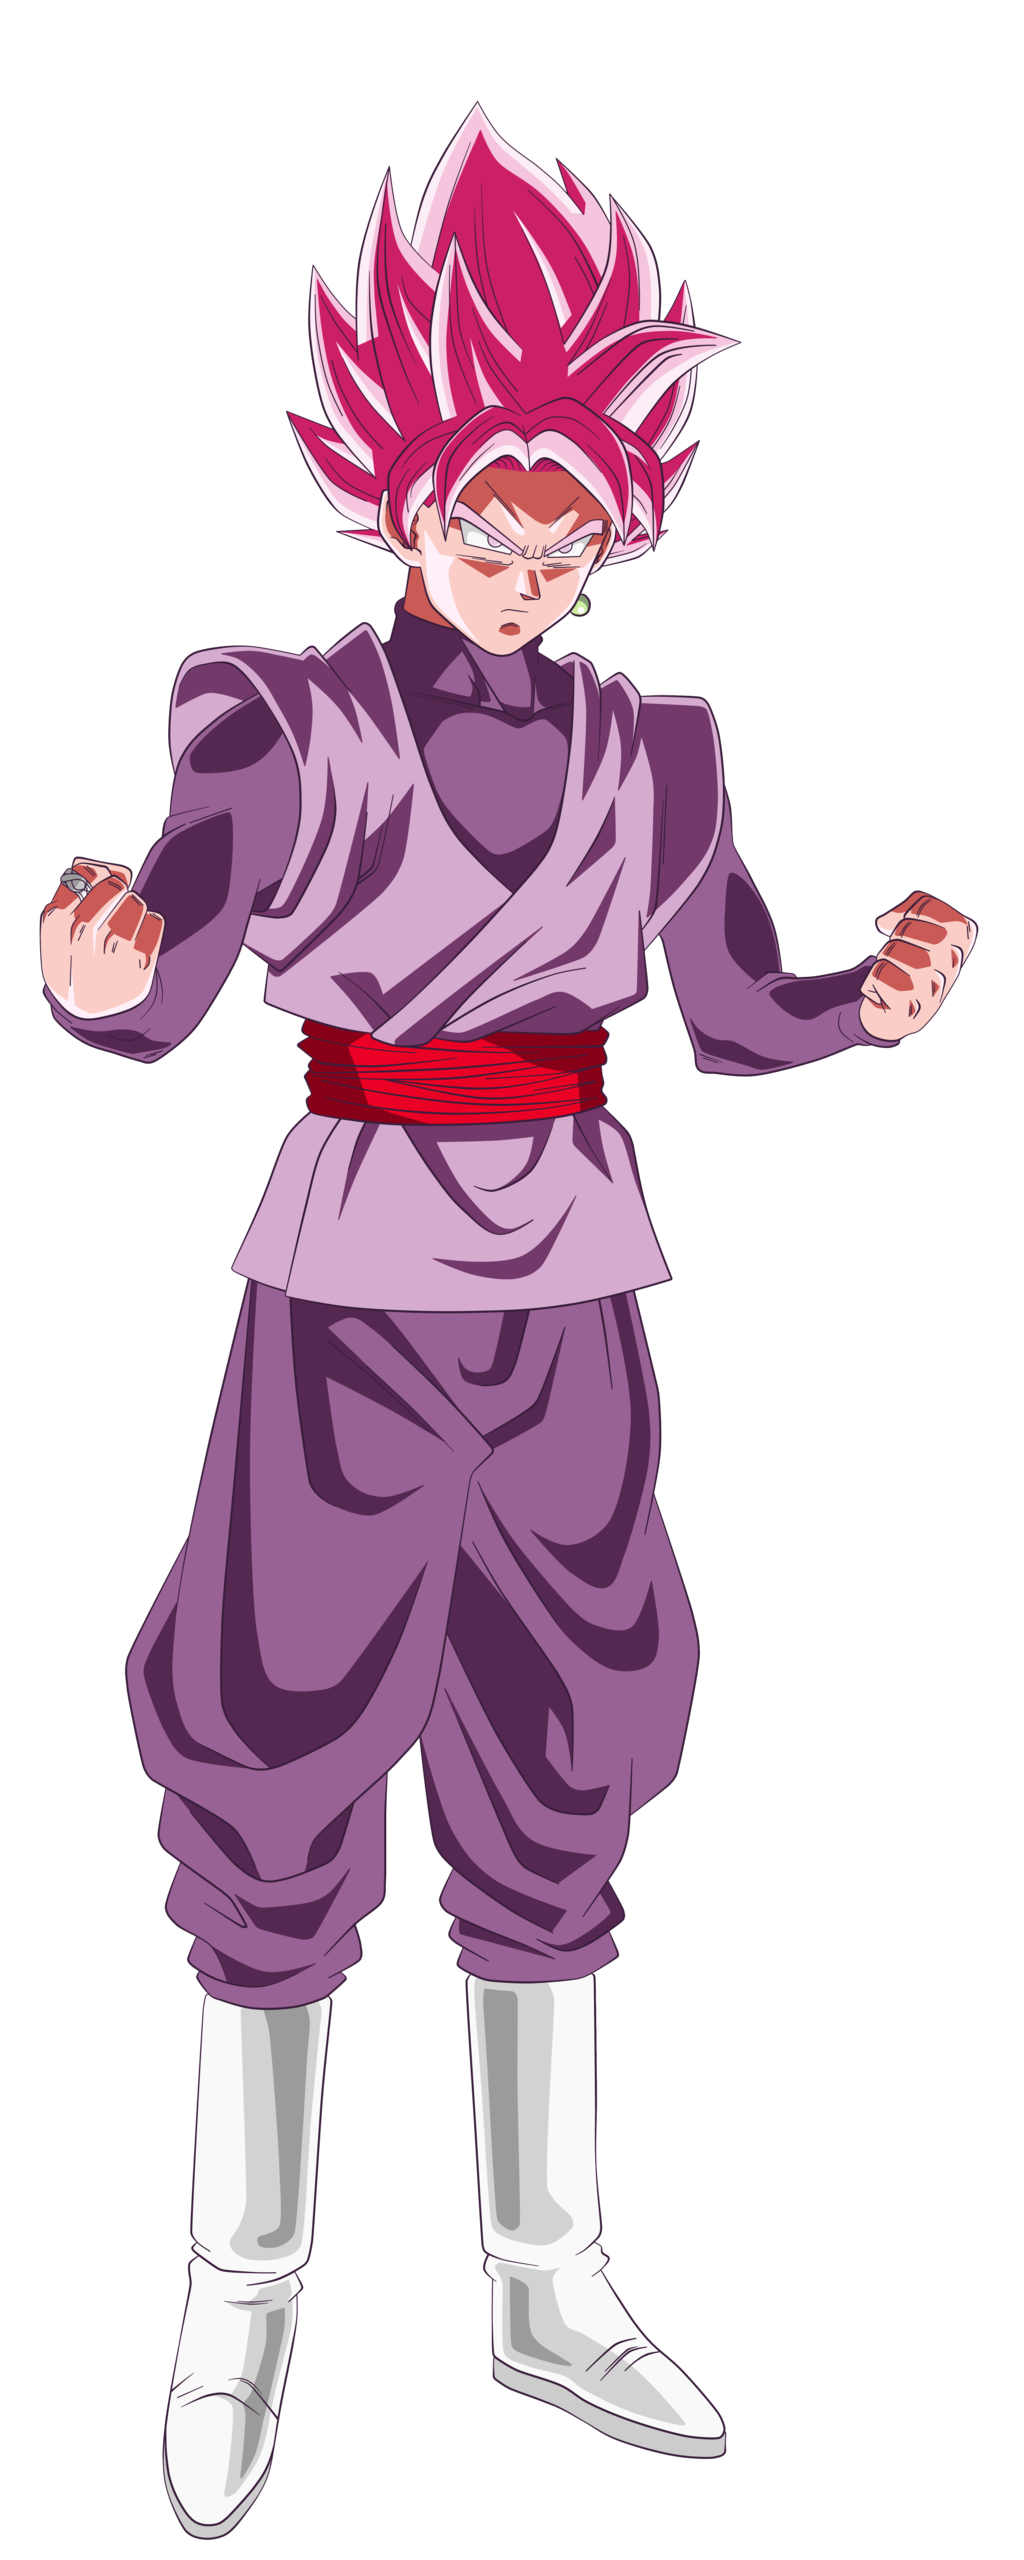 Black Rose By Nekoar On Deviantart Visit Now For 3d Dragon Ball Z Compression Shirts Now On Sale Anime Dragon Ball Super Goku Black Dragon Ball Super Goku